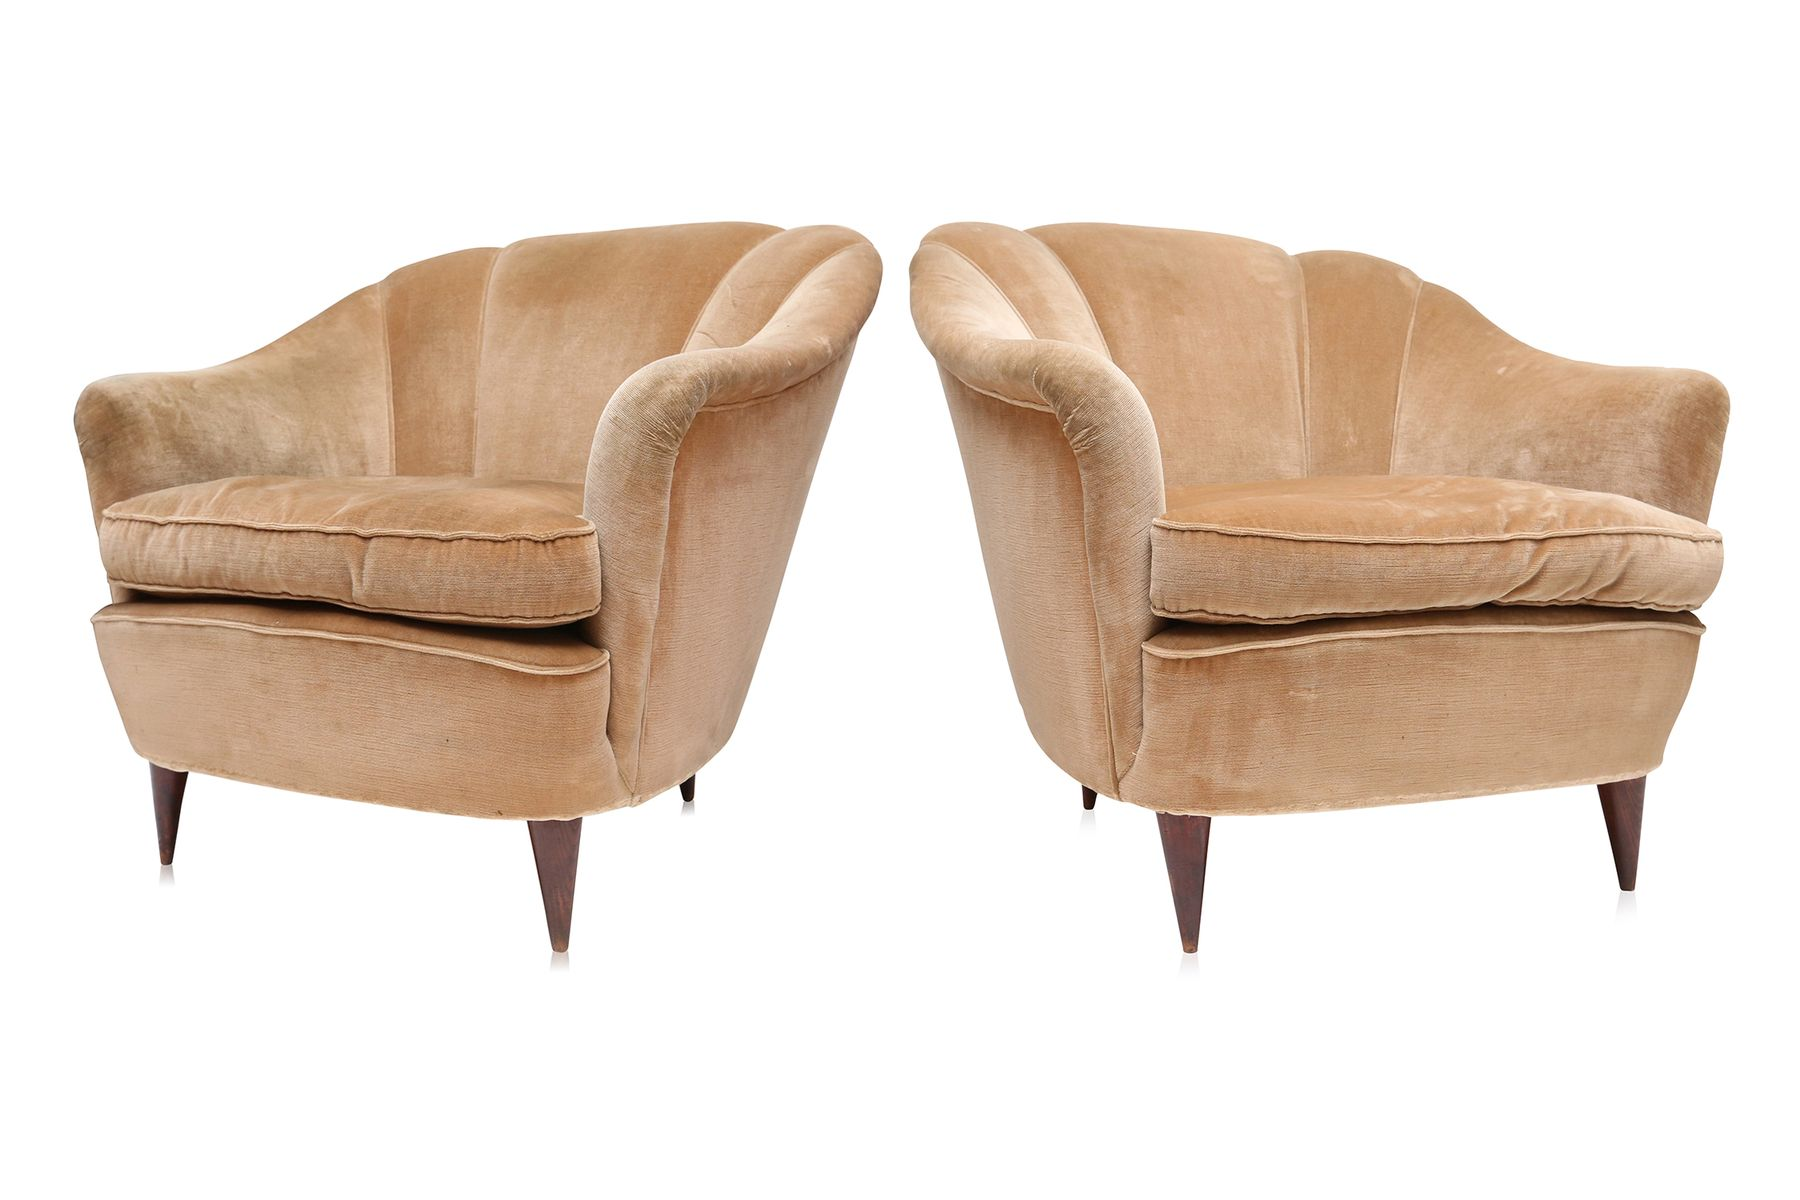 gold velvet chair high back mesh with headrest art deco light club chairs 1940s set of 2